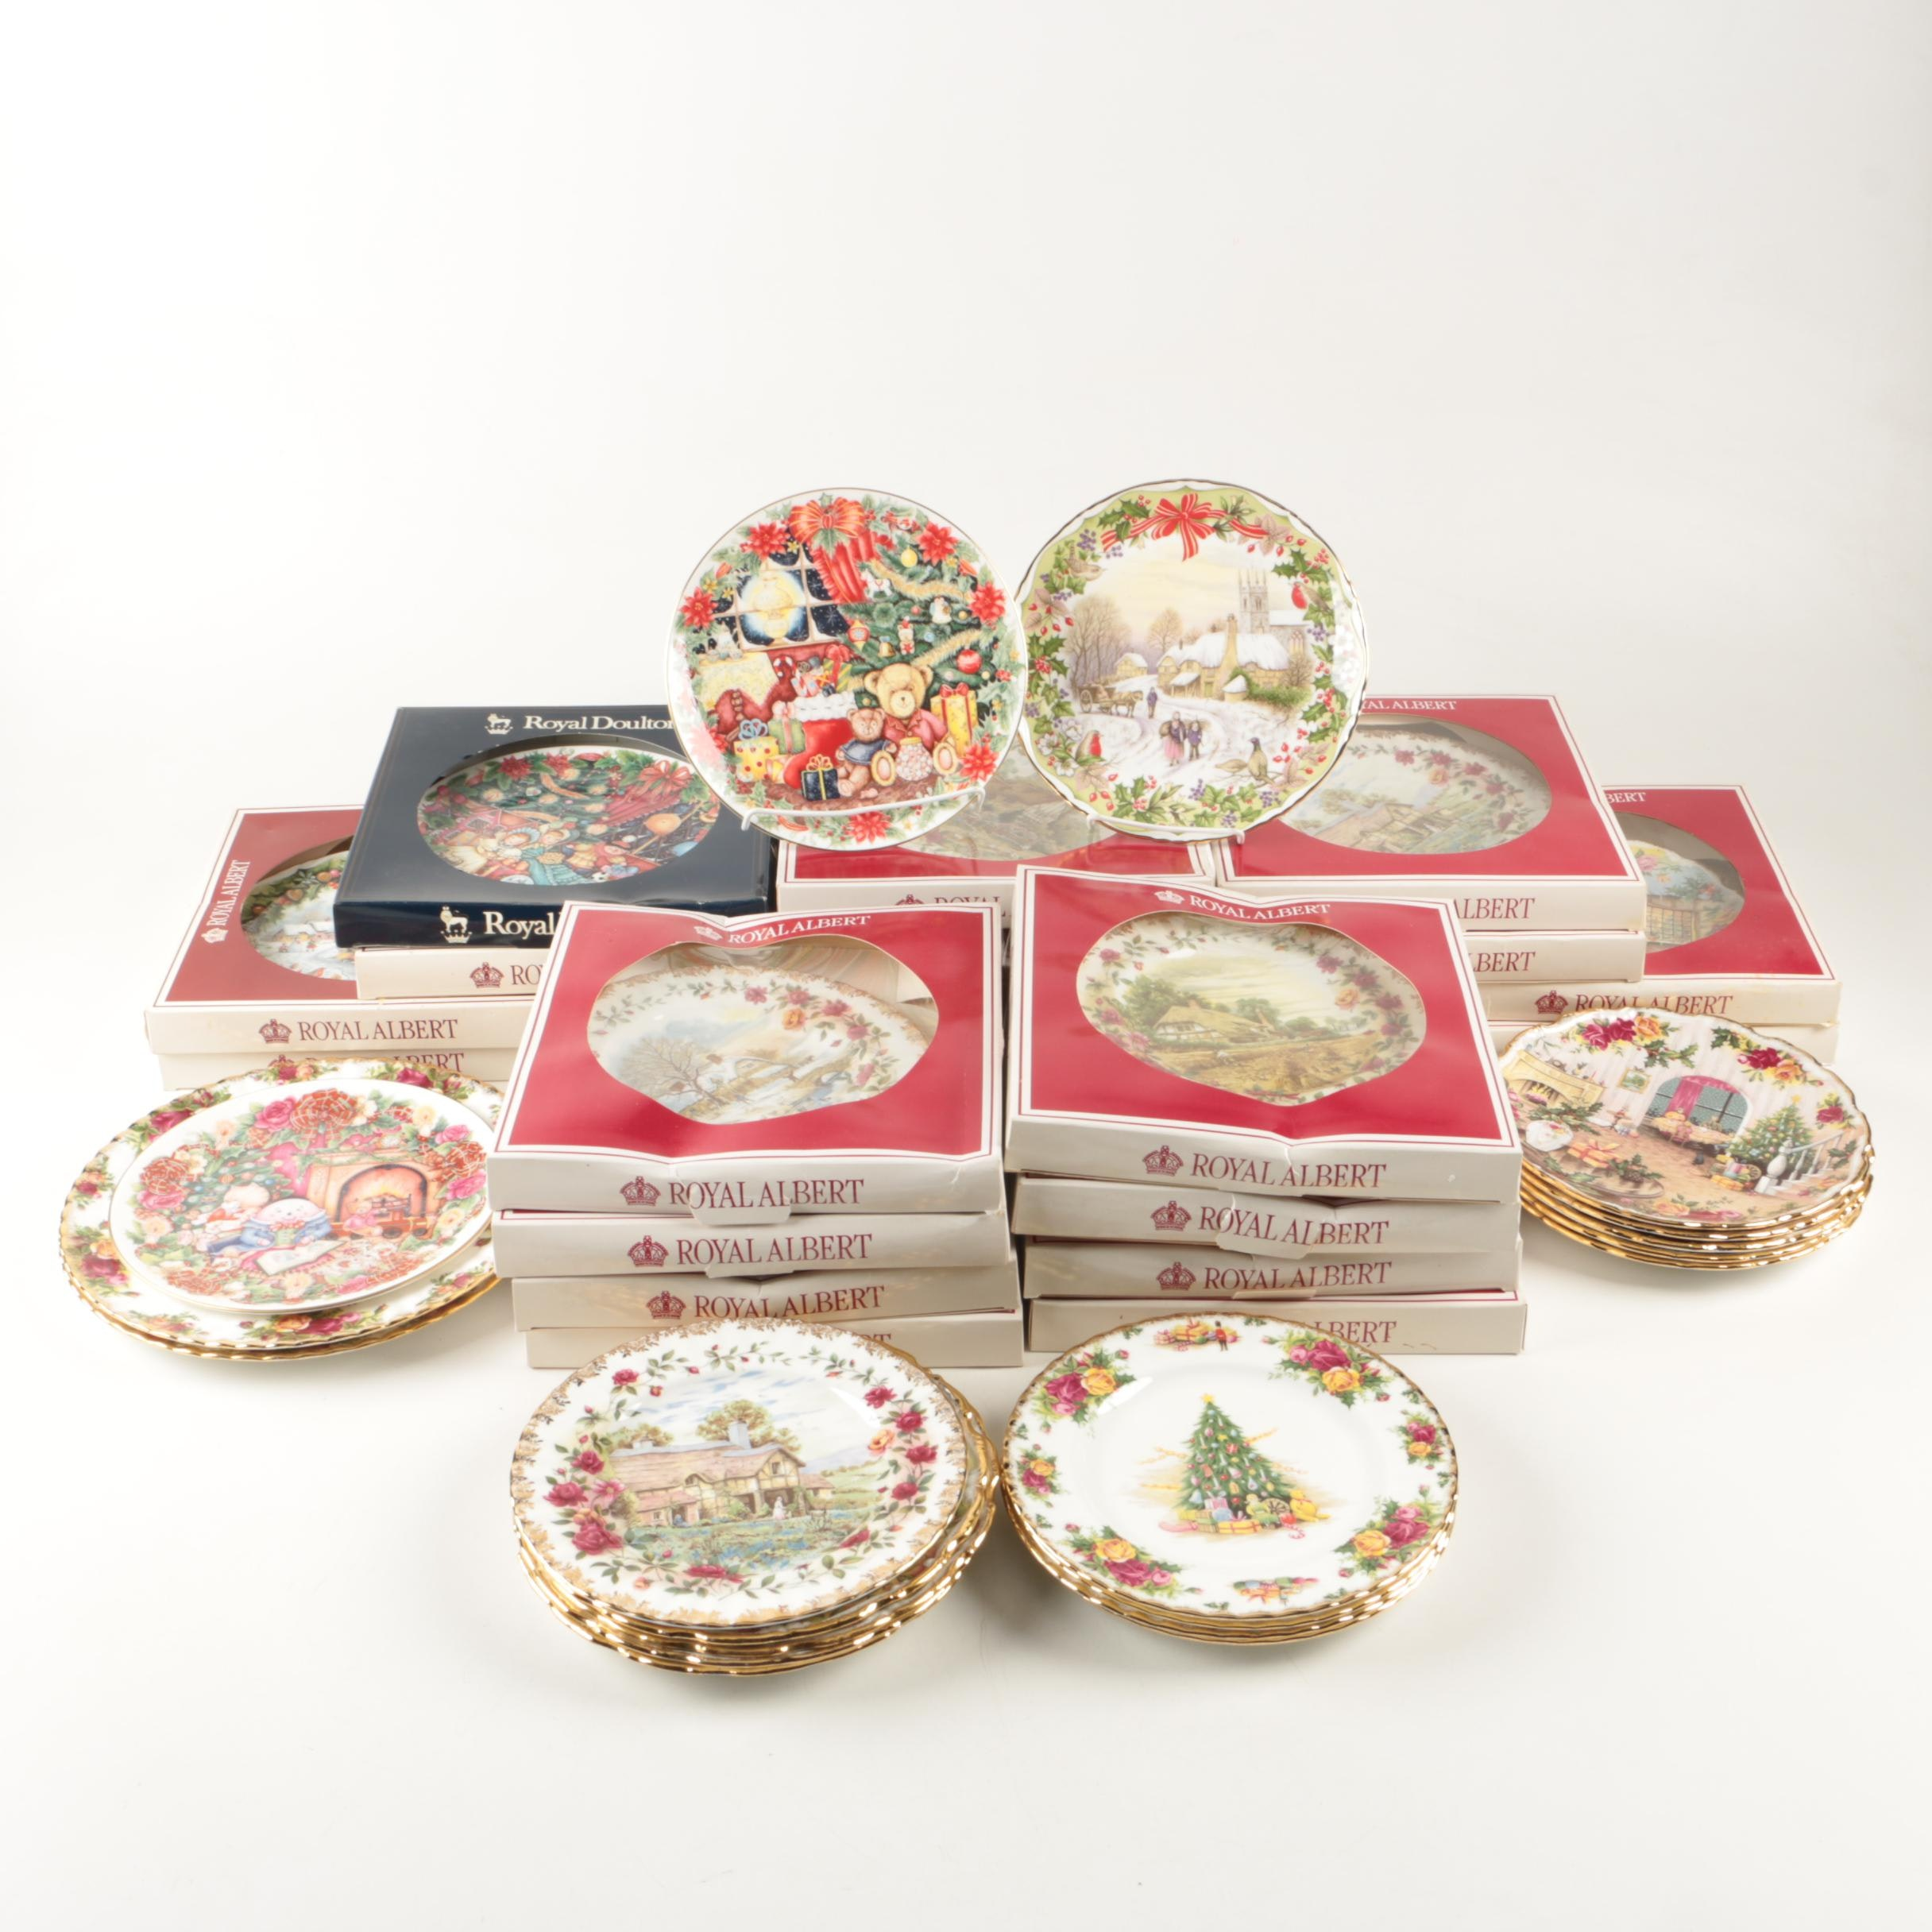 Royal Albert Decorative Plates